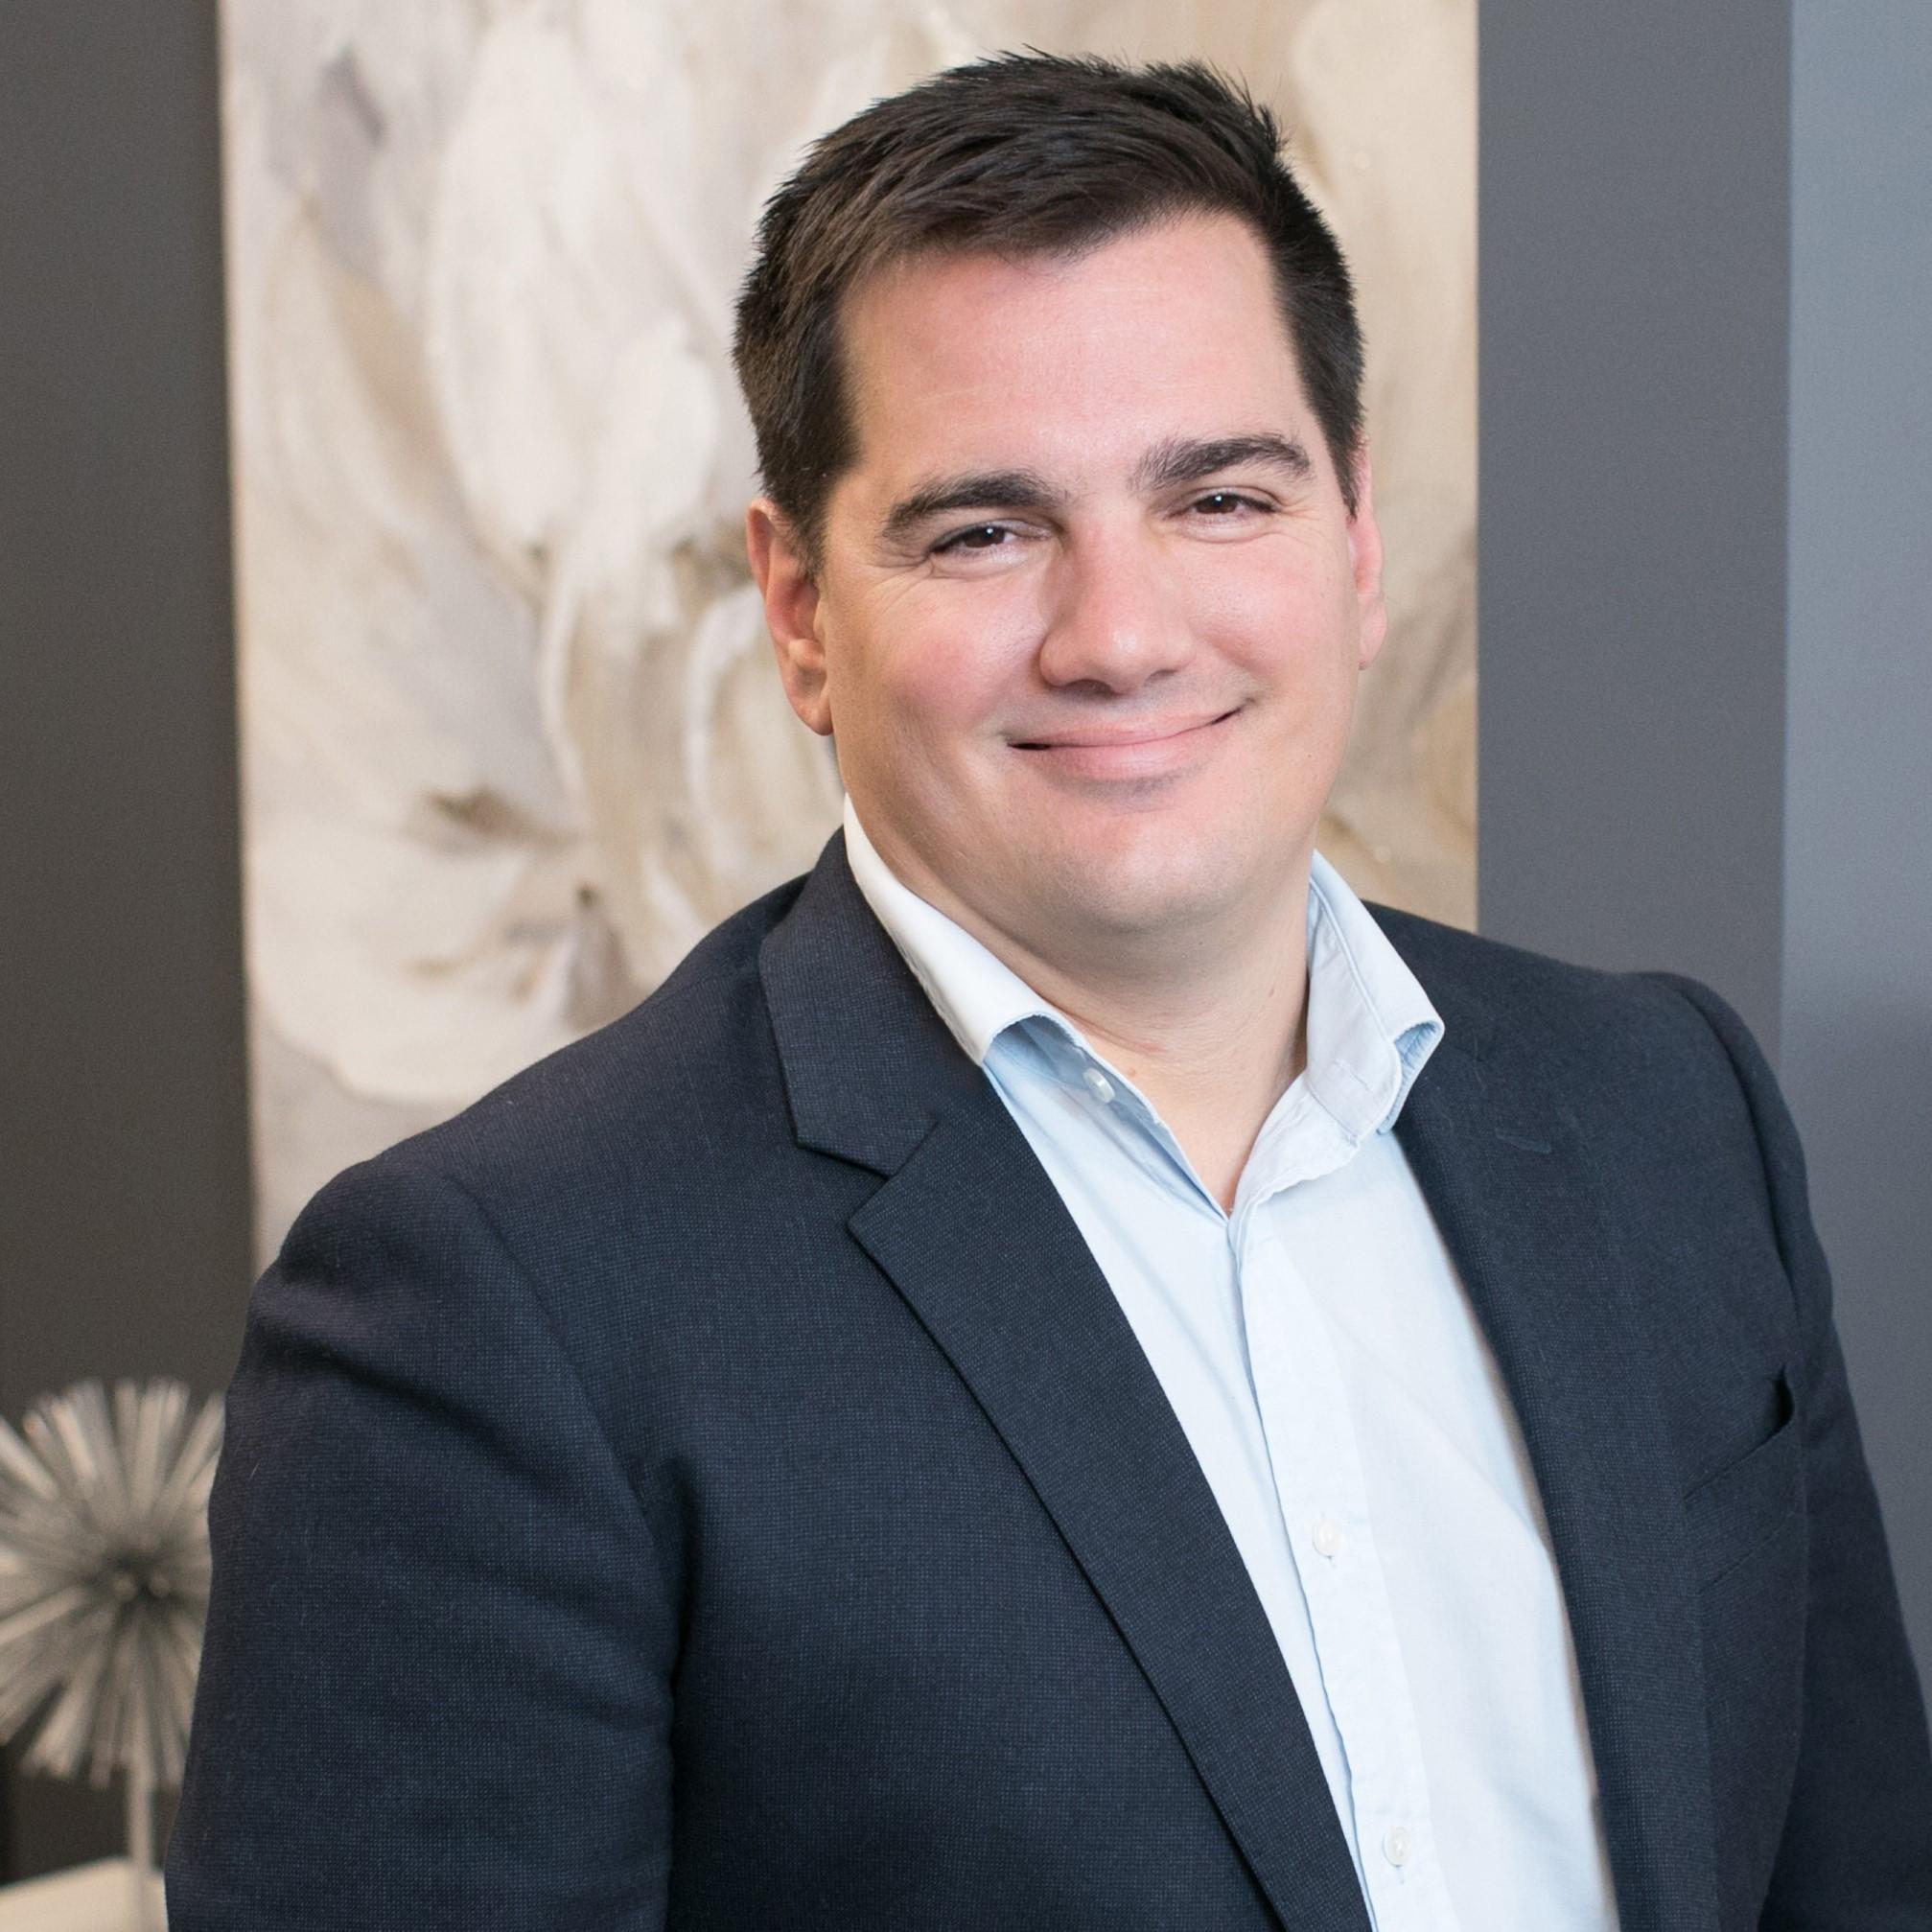 Ioannis Saratsis